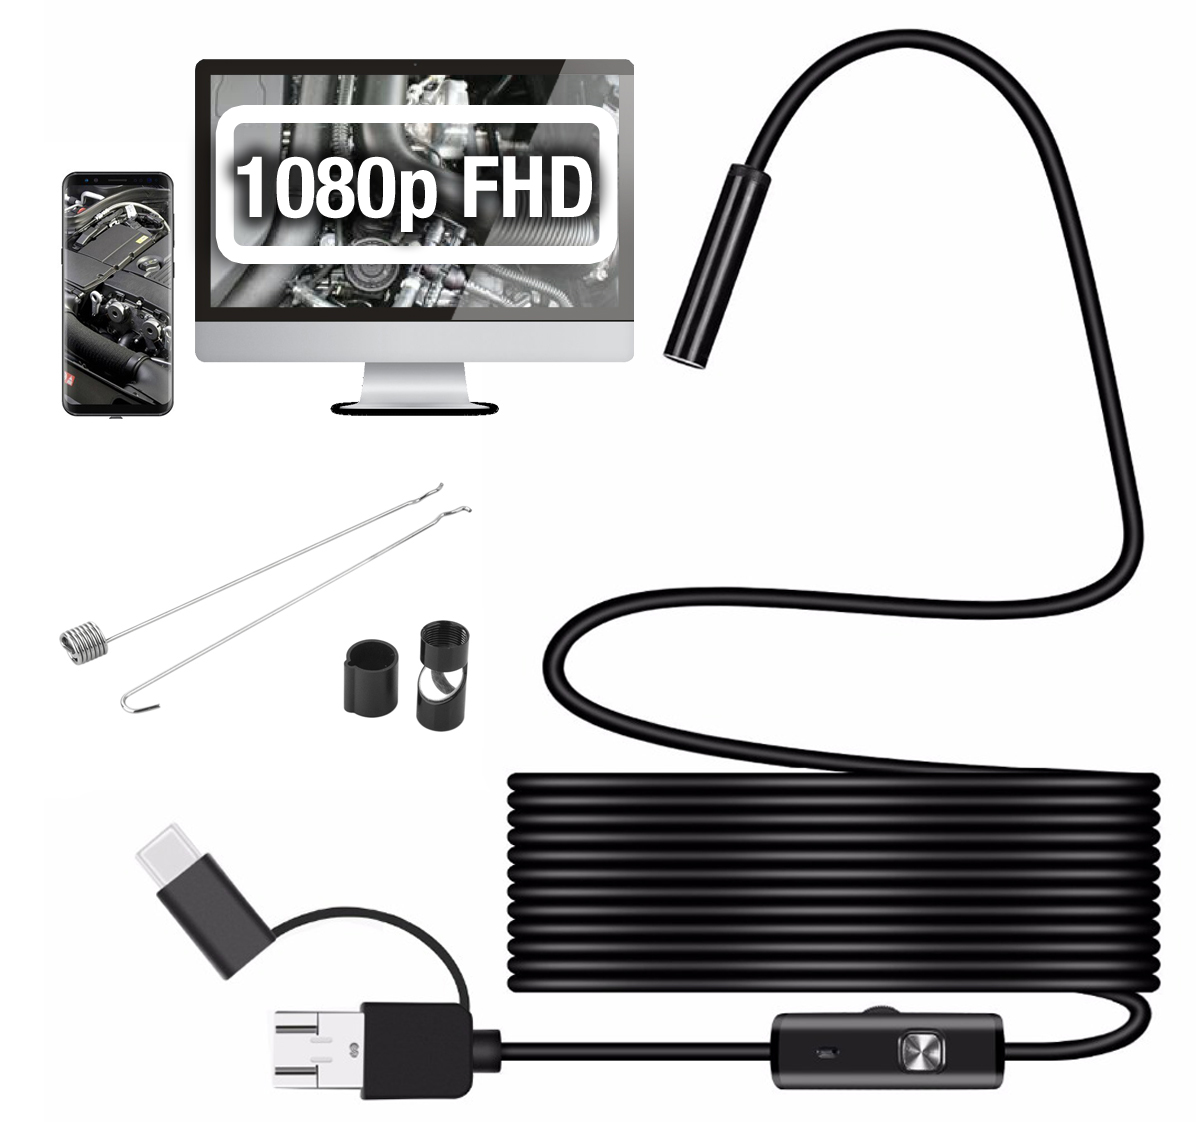 ENDOSKOP Kamera INSPEKCYJNA FHD 1080 ANDROID USB-C